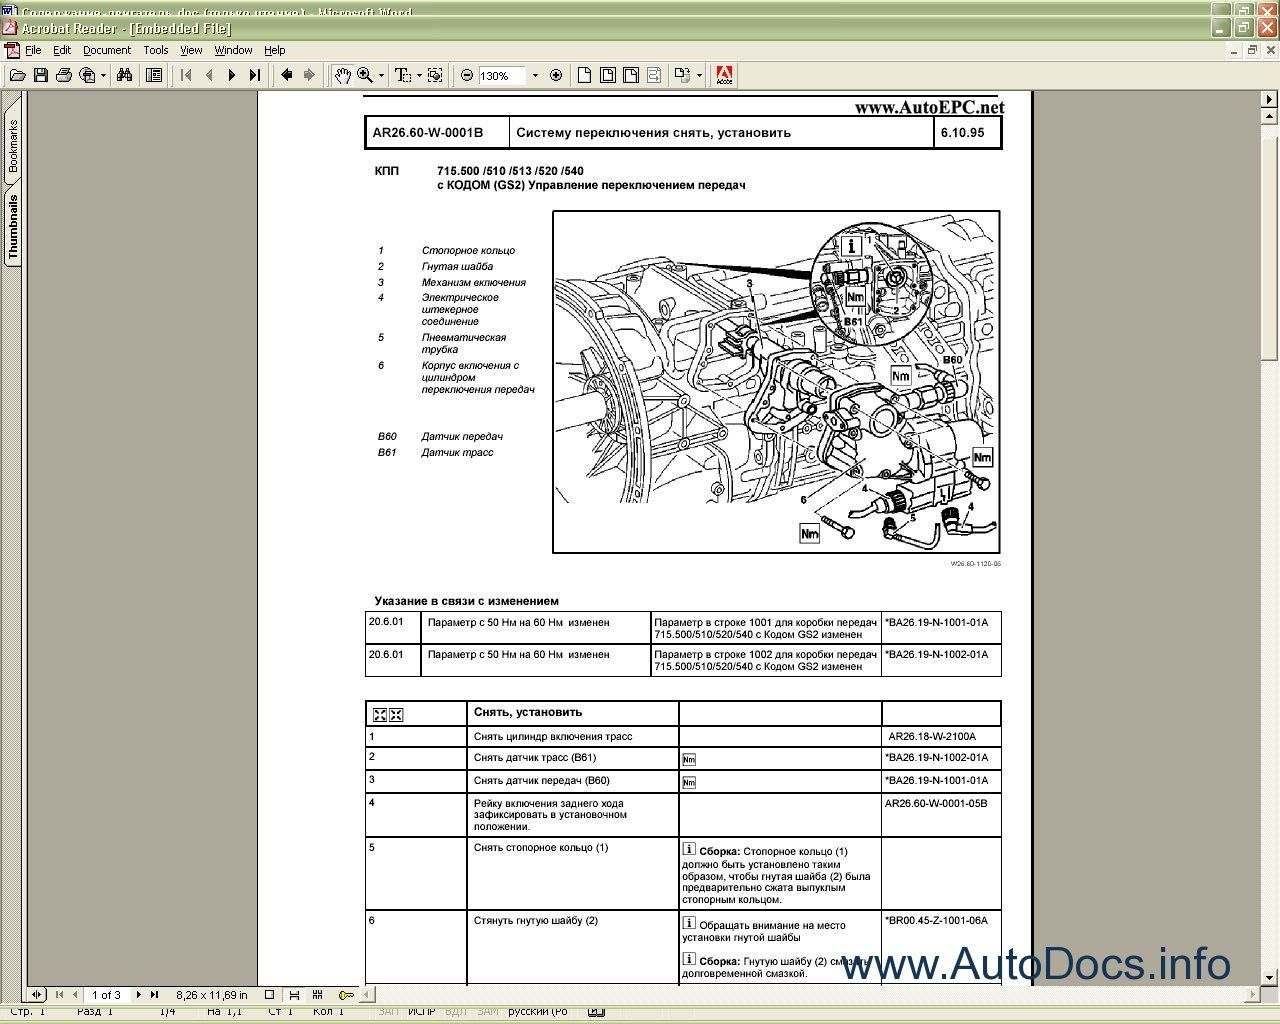 Mercedes Benz Actros Maintenance Manual 1 Mercedes Benz Mercedes Benz